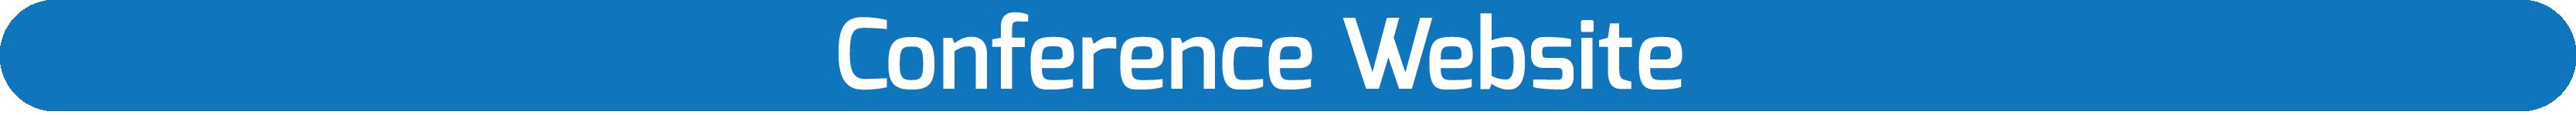 ConferenceWebsite